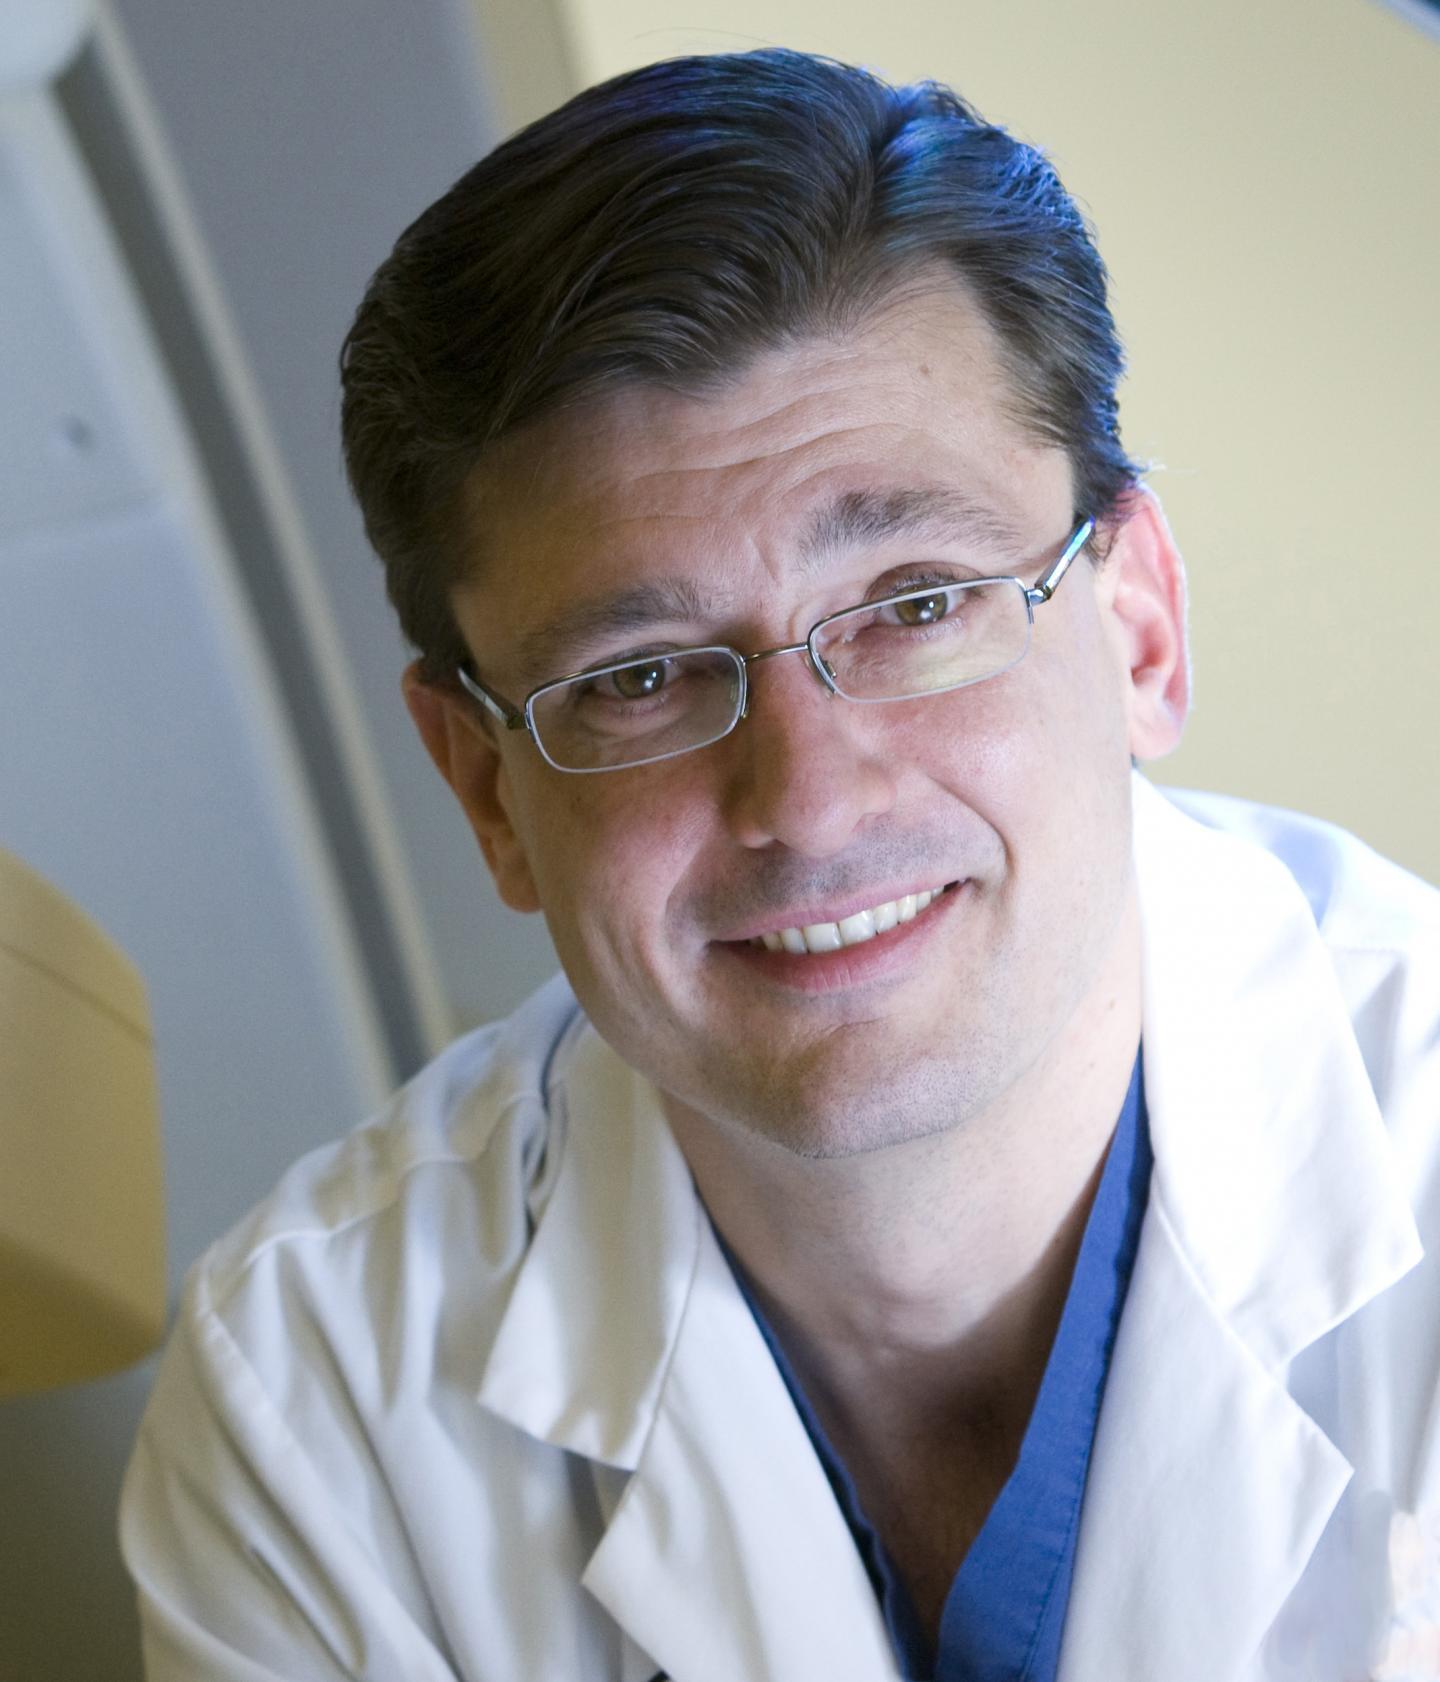 Todd Vogel, University of Missouri-Columbia